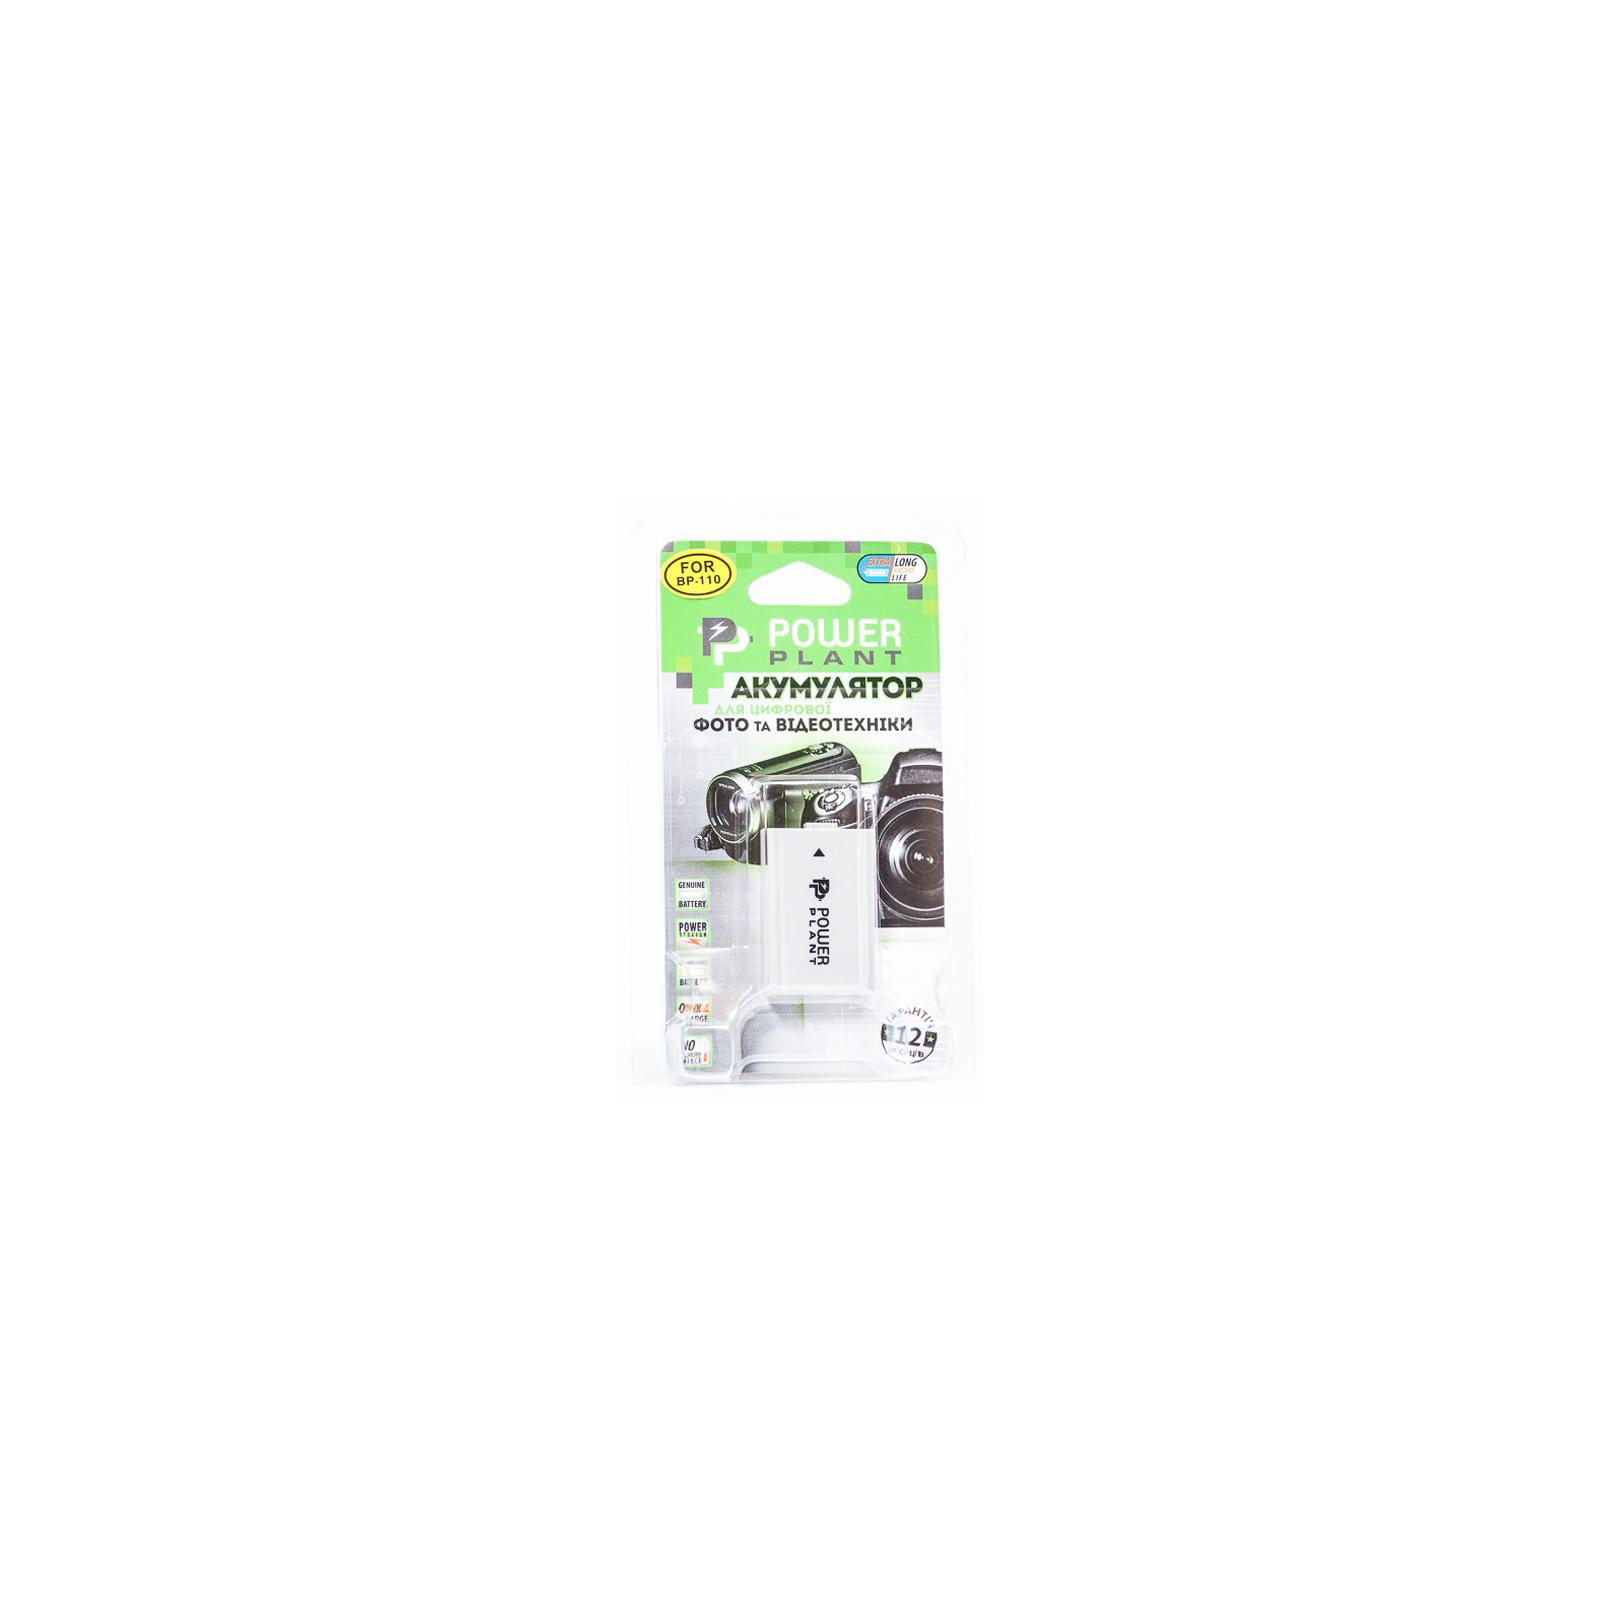 Аккумулятор к фото/видео PowerPlant Canon BP-110 (DV00DV1329) изображение 4